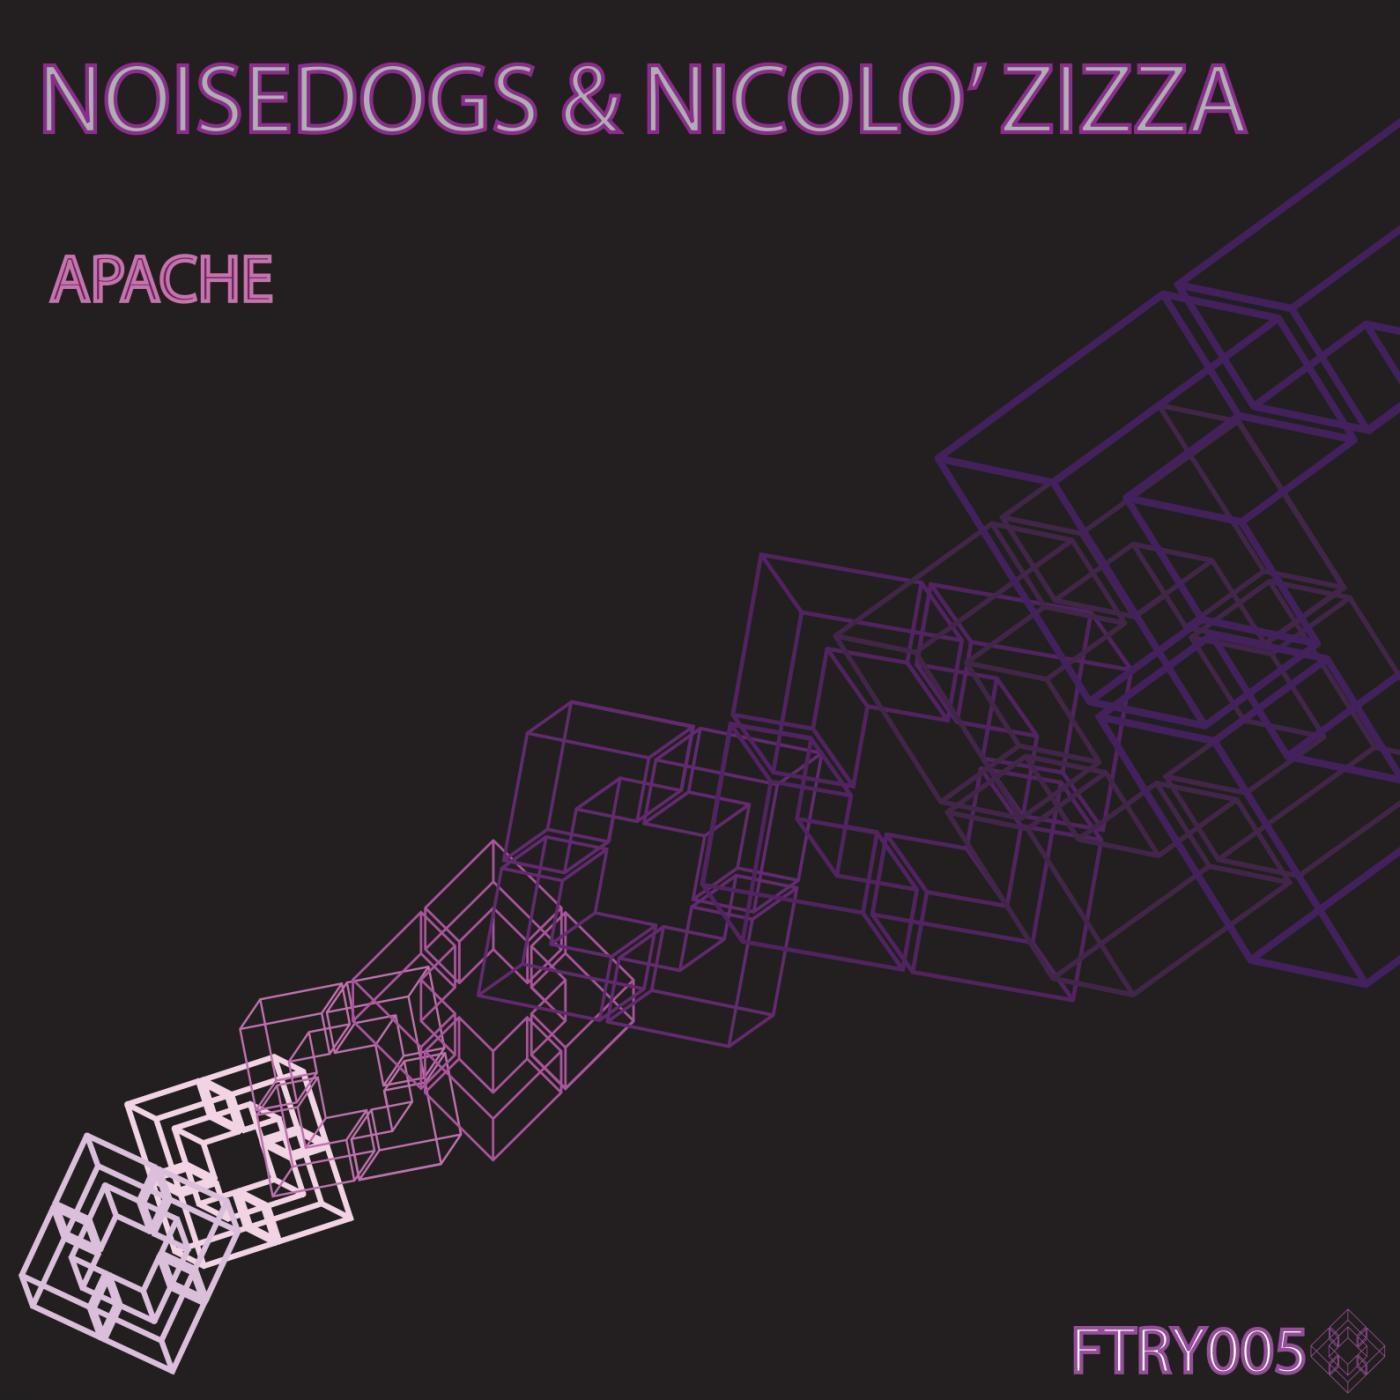 Noisedogs & Nicolo Zizza - Macotrip (Original mix)